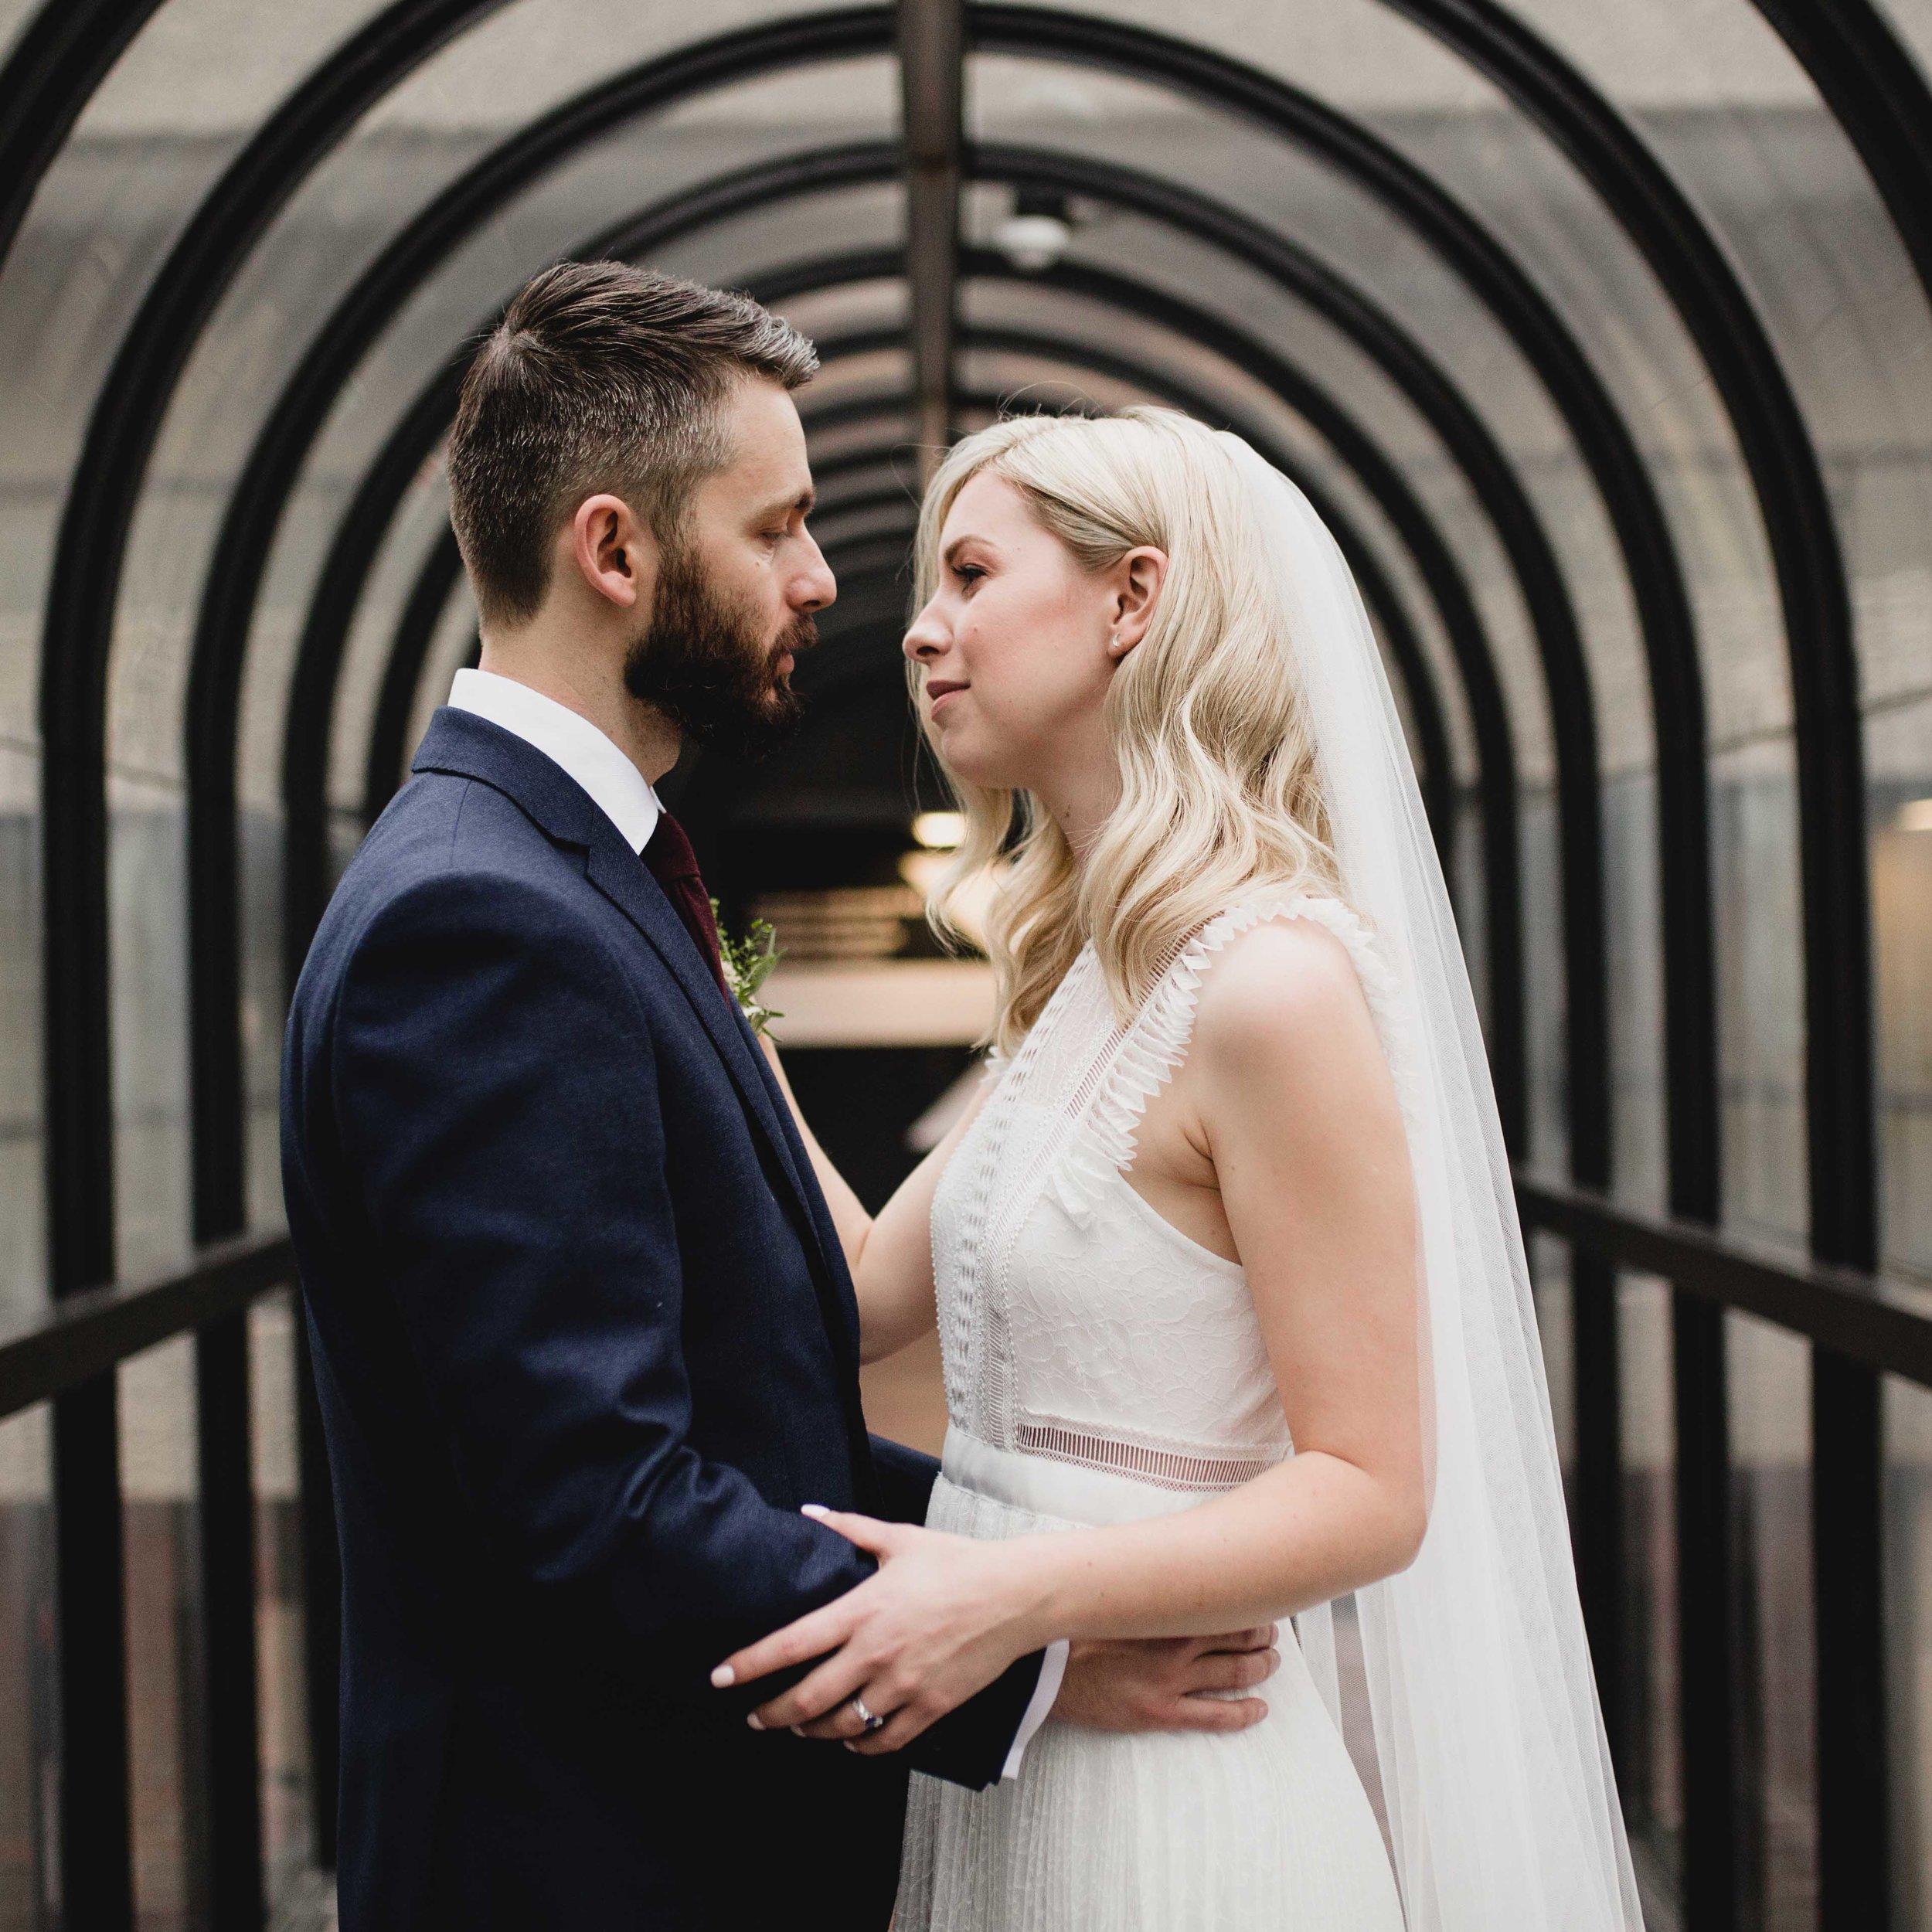 Chris & Gemma weddingSQUARE (6).jpg